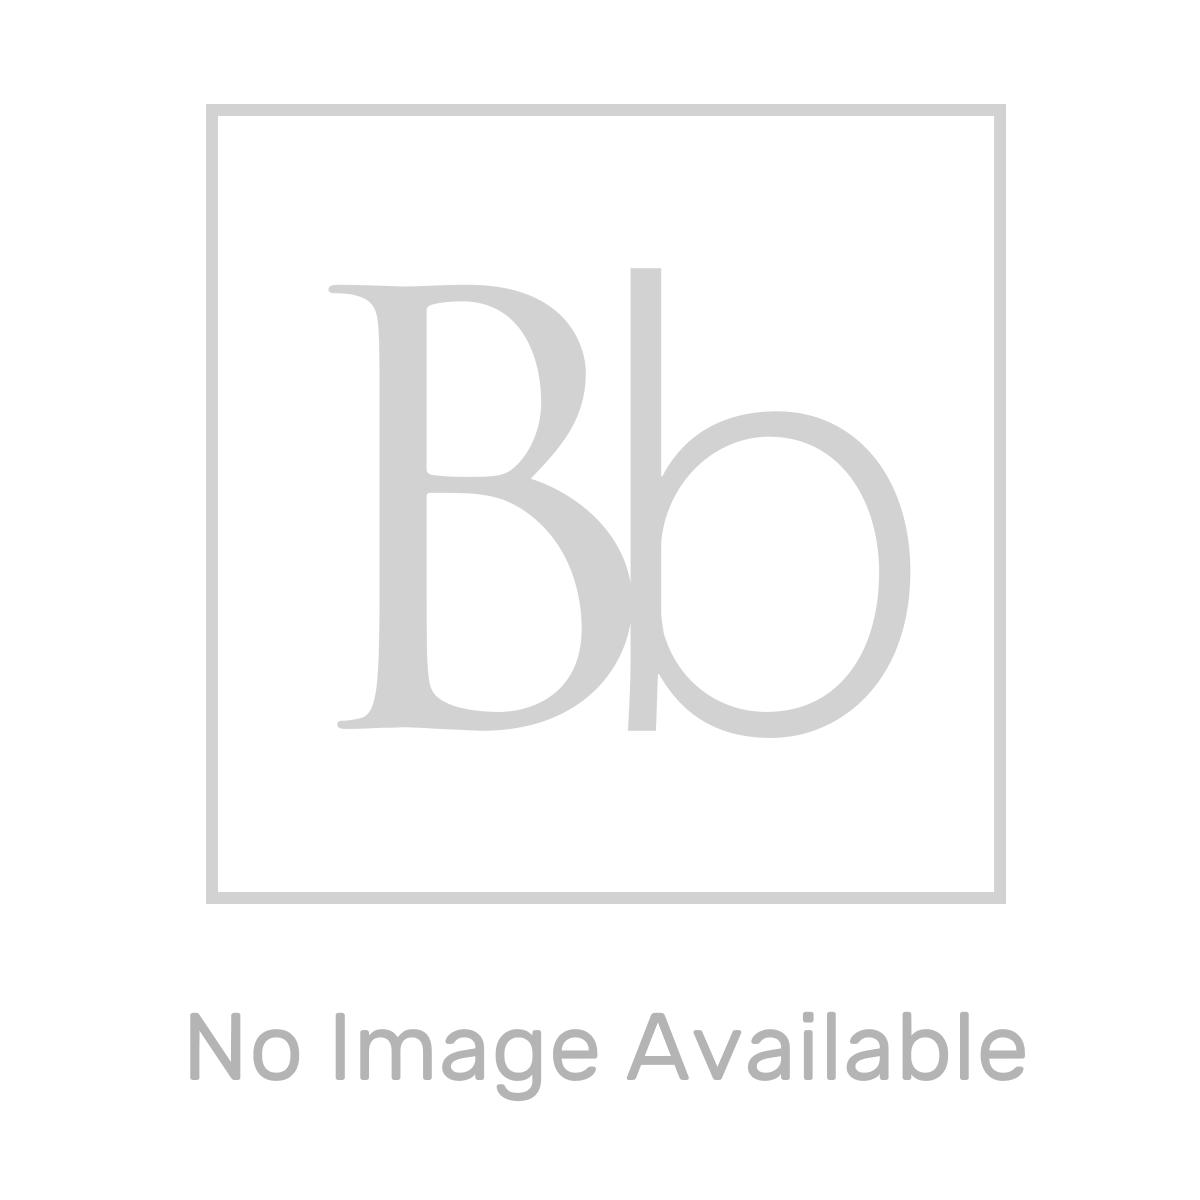 RAK Surface Greige Matt Tile 750 x 750mm Lifestyle